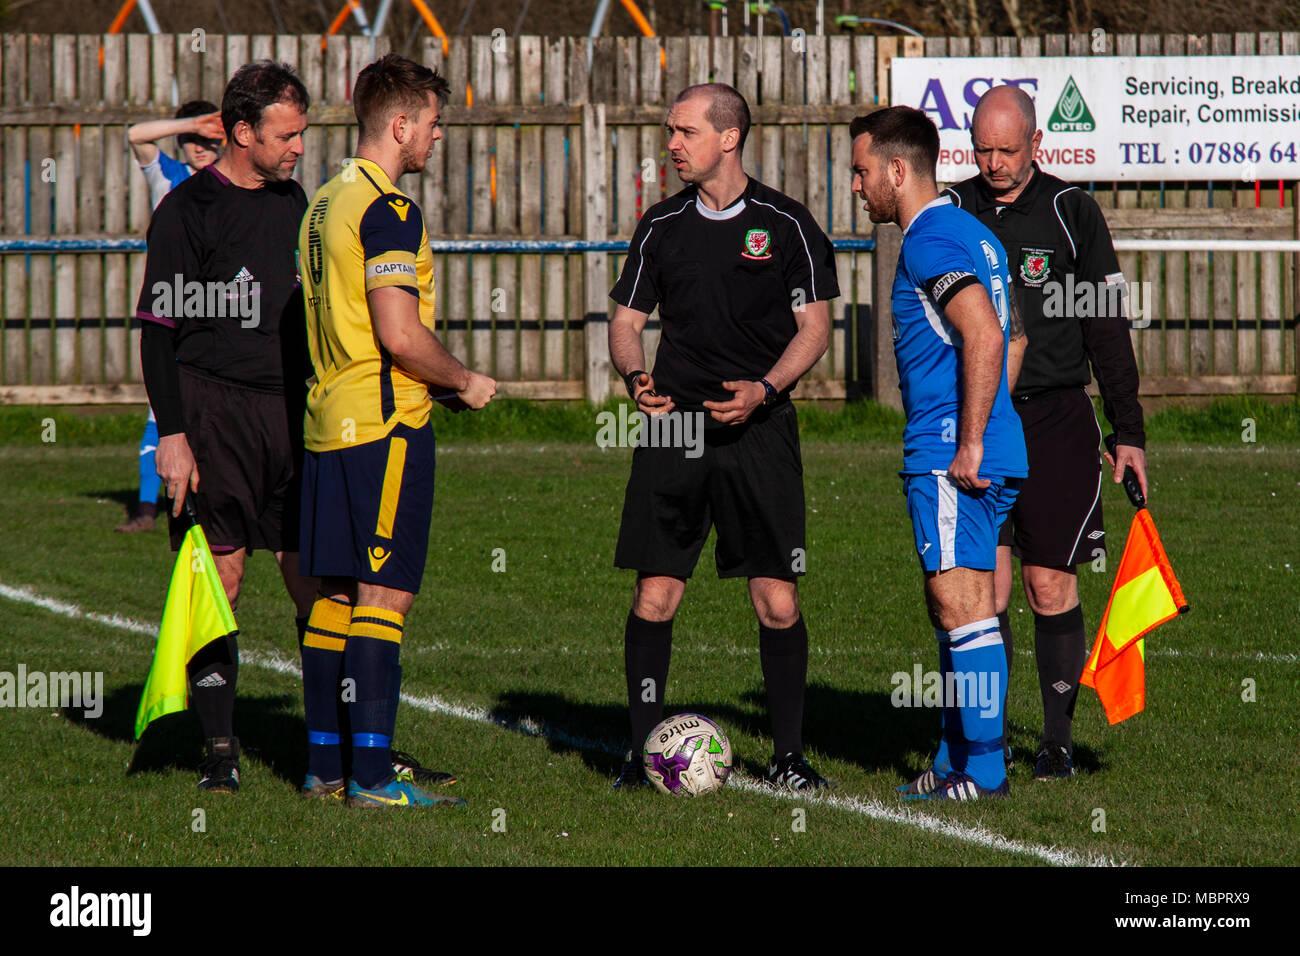 Cwmamman United 2-2 Port Talbot Town. Stock Photo